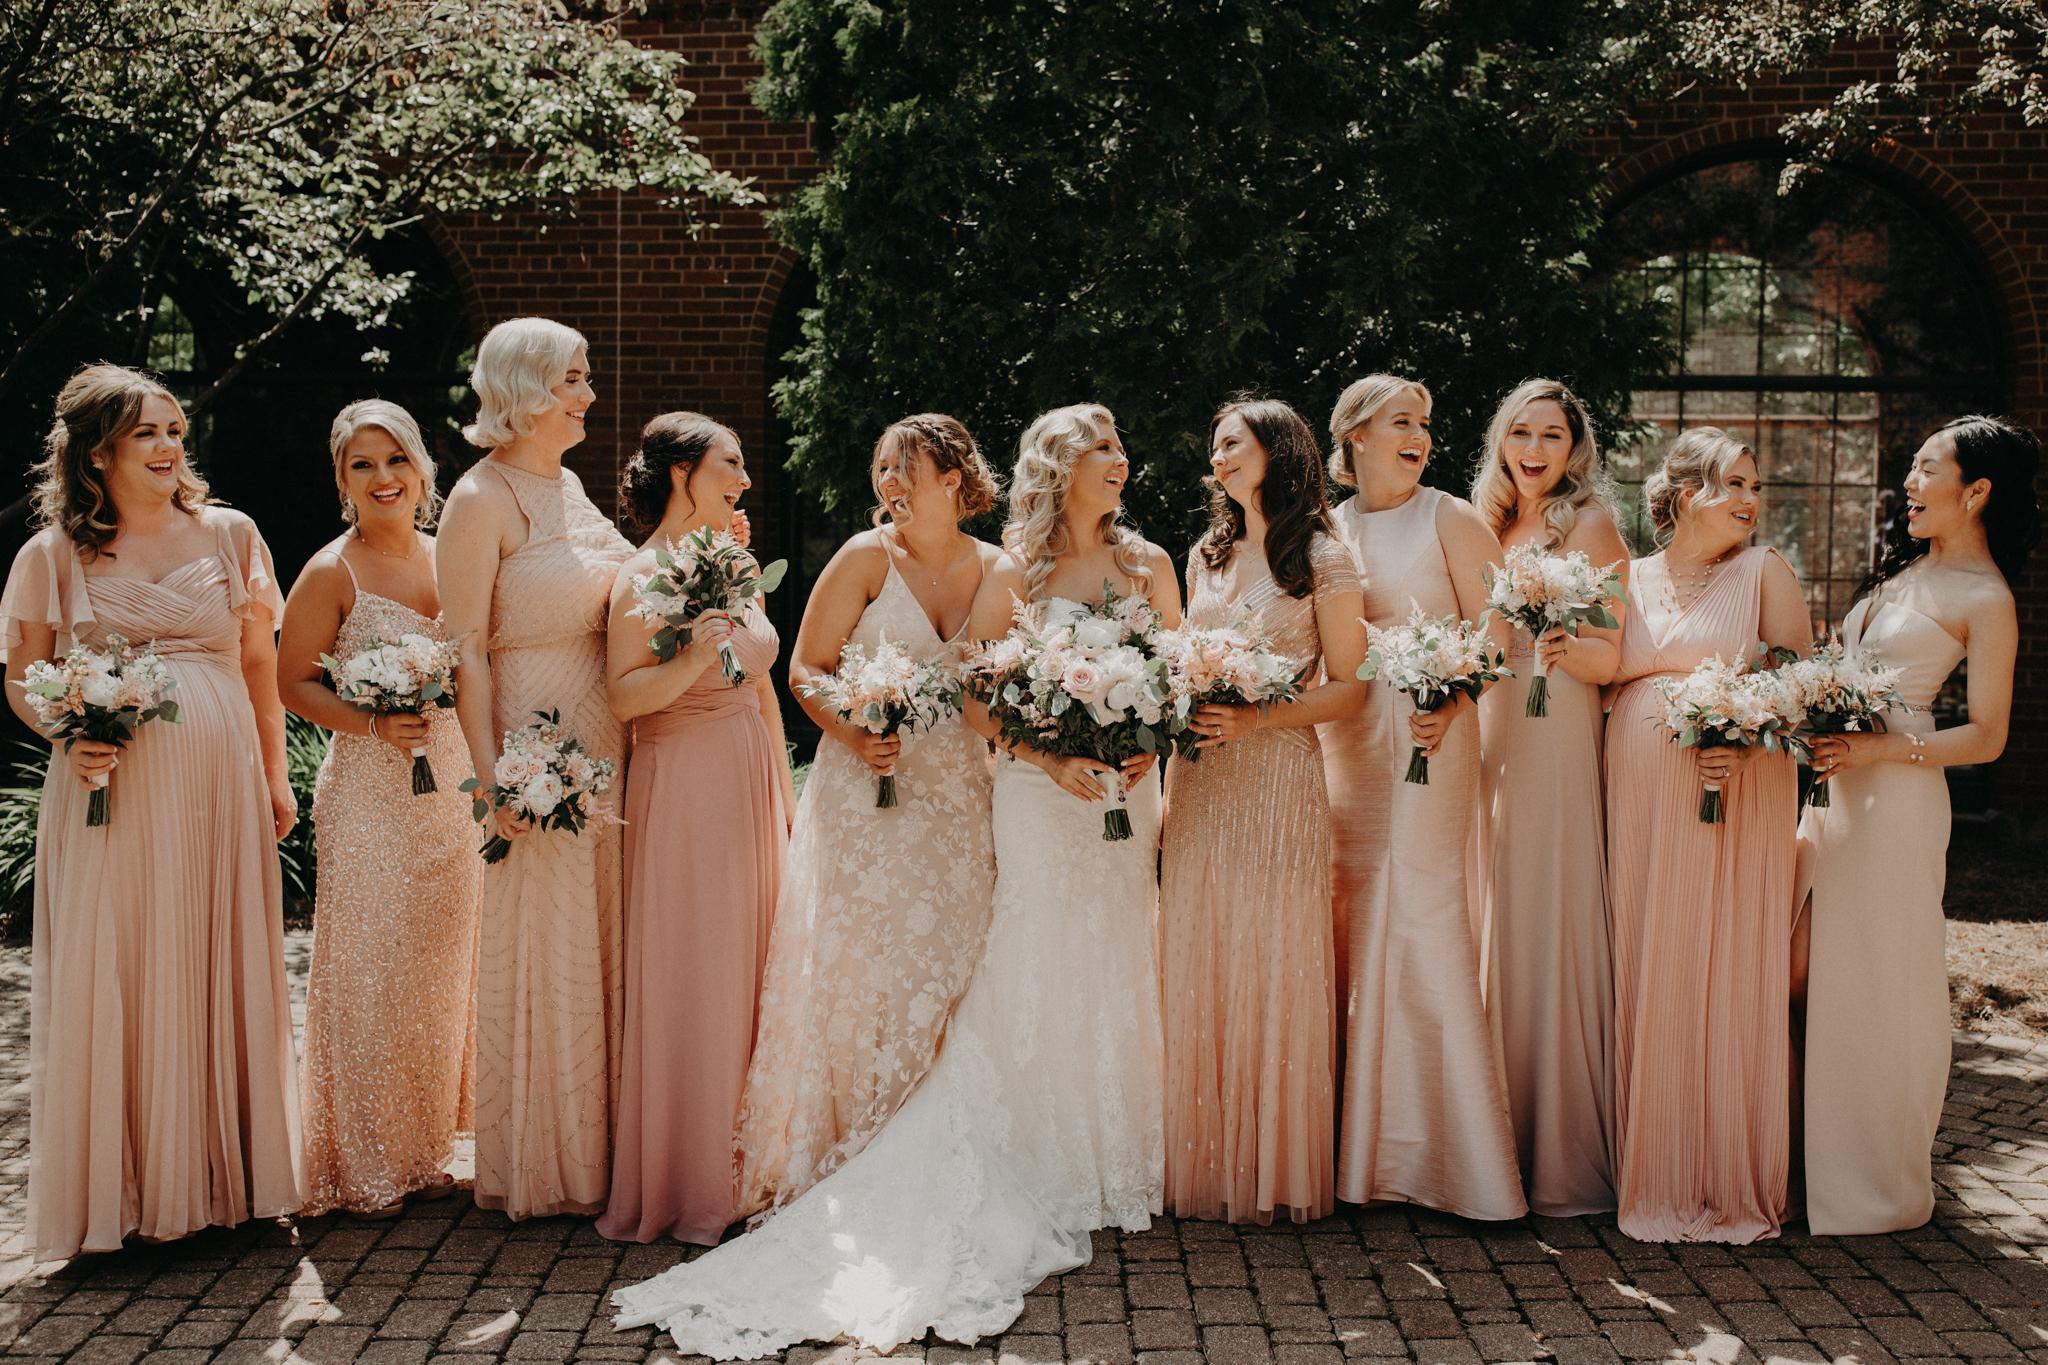 The-Inn-At-St-Johns-Wedding-18.jpg